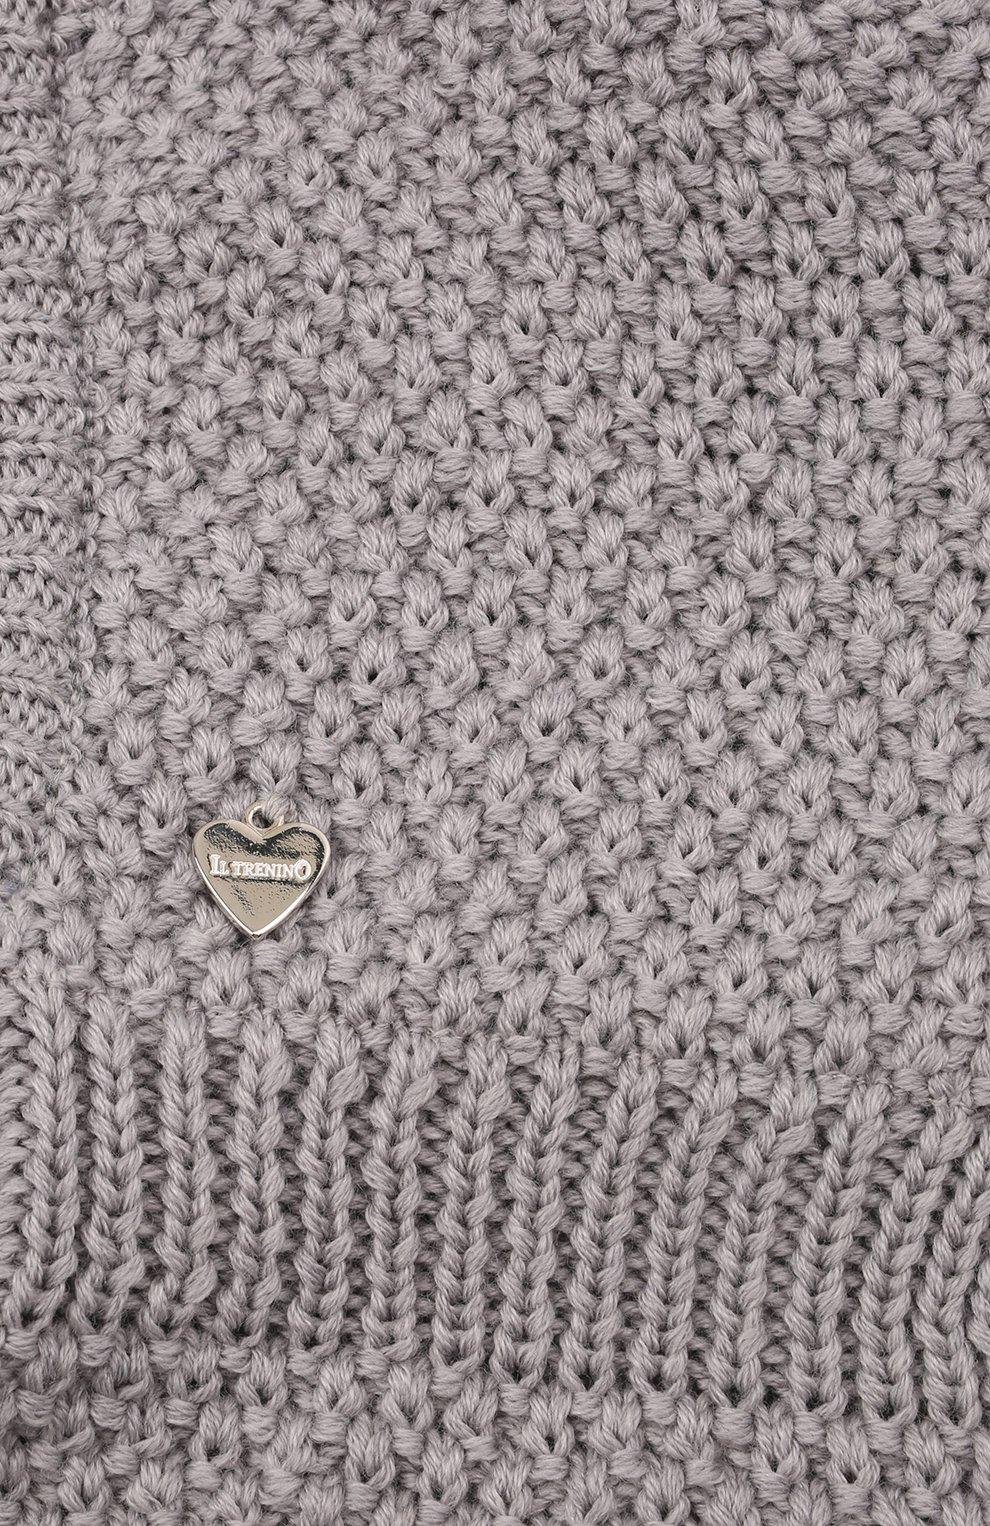 Детского шерстяная шапка-балаклава IL TRENINO серого цвета, арт. 19 5970/18 | Фото 3 (Материал: Шерсть)